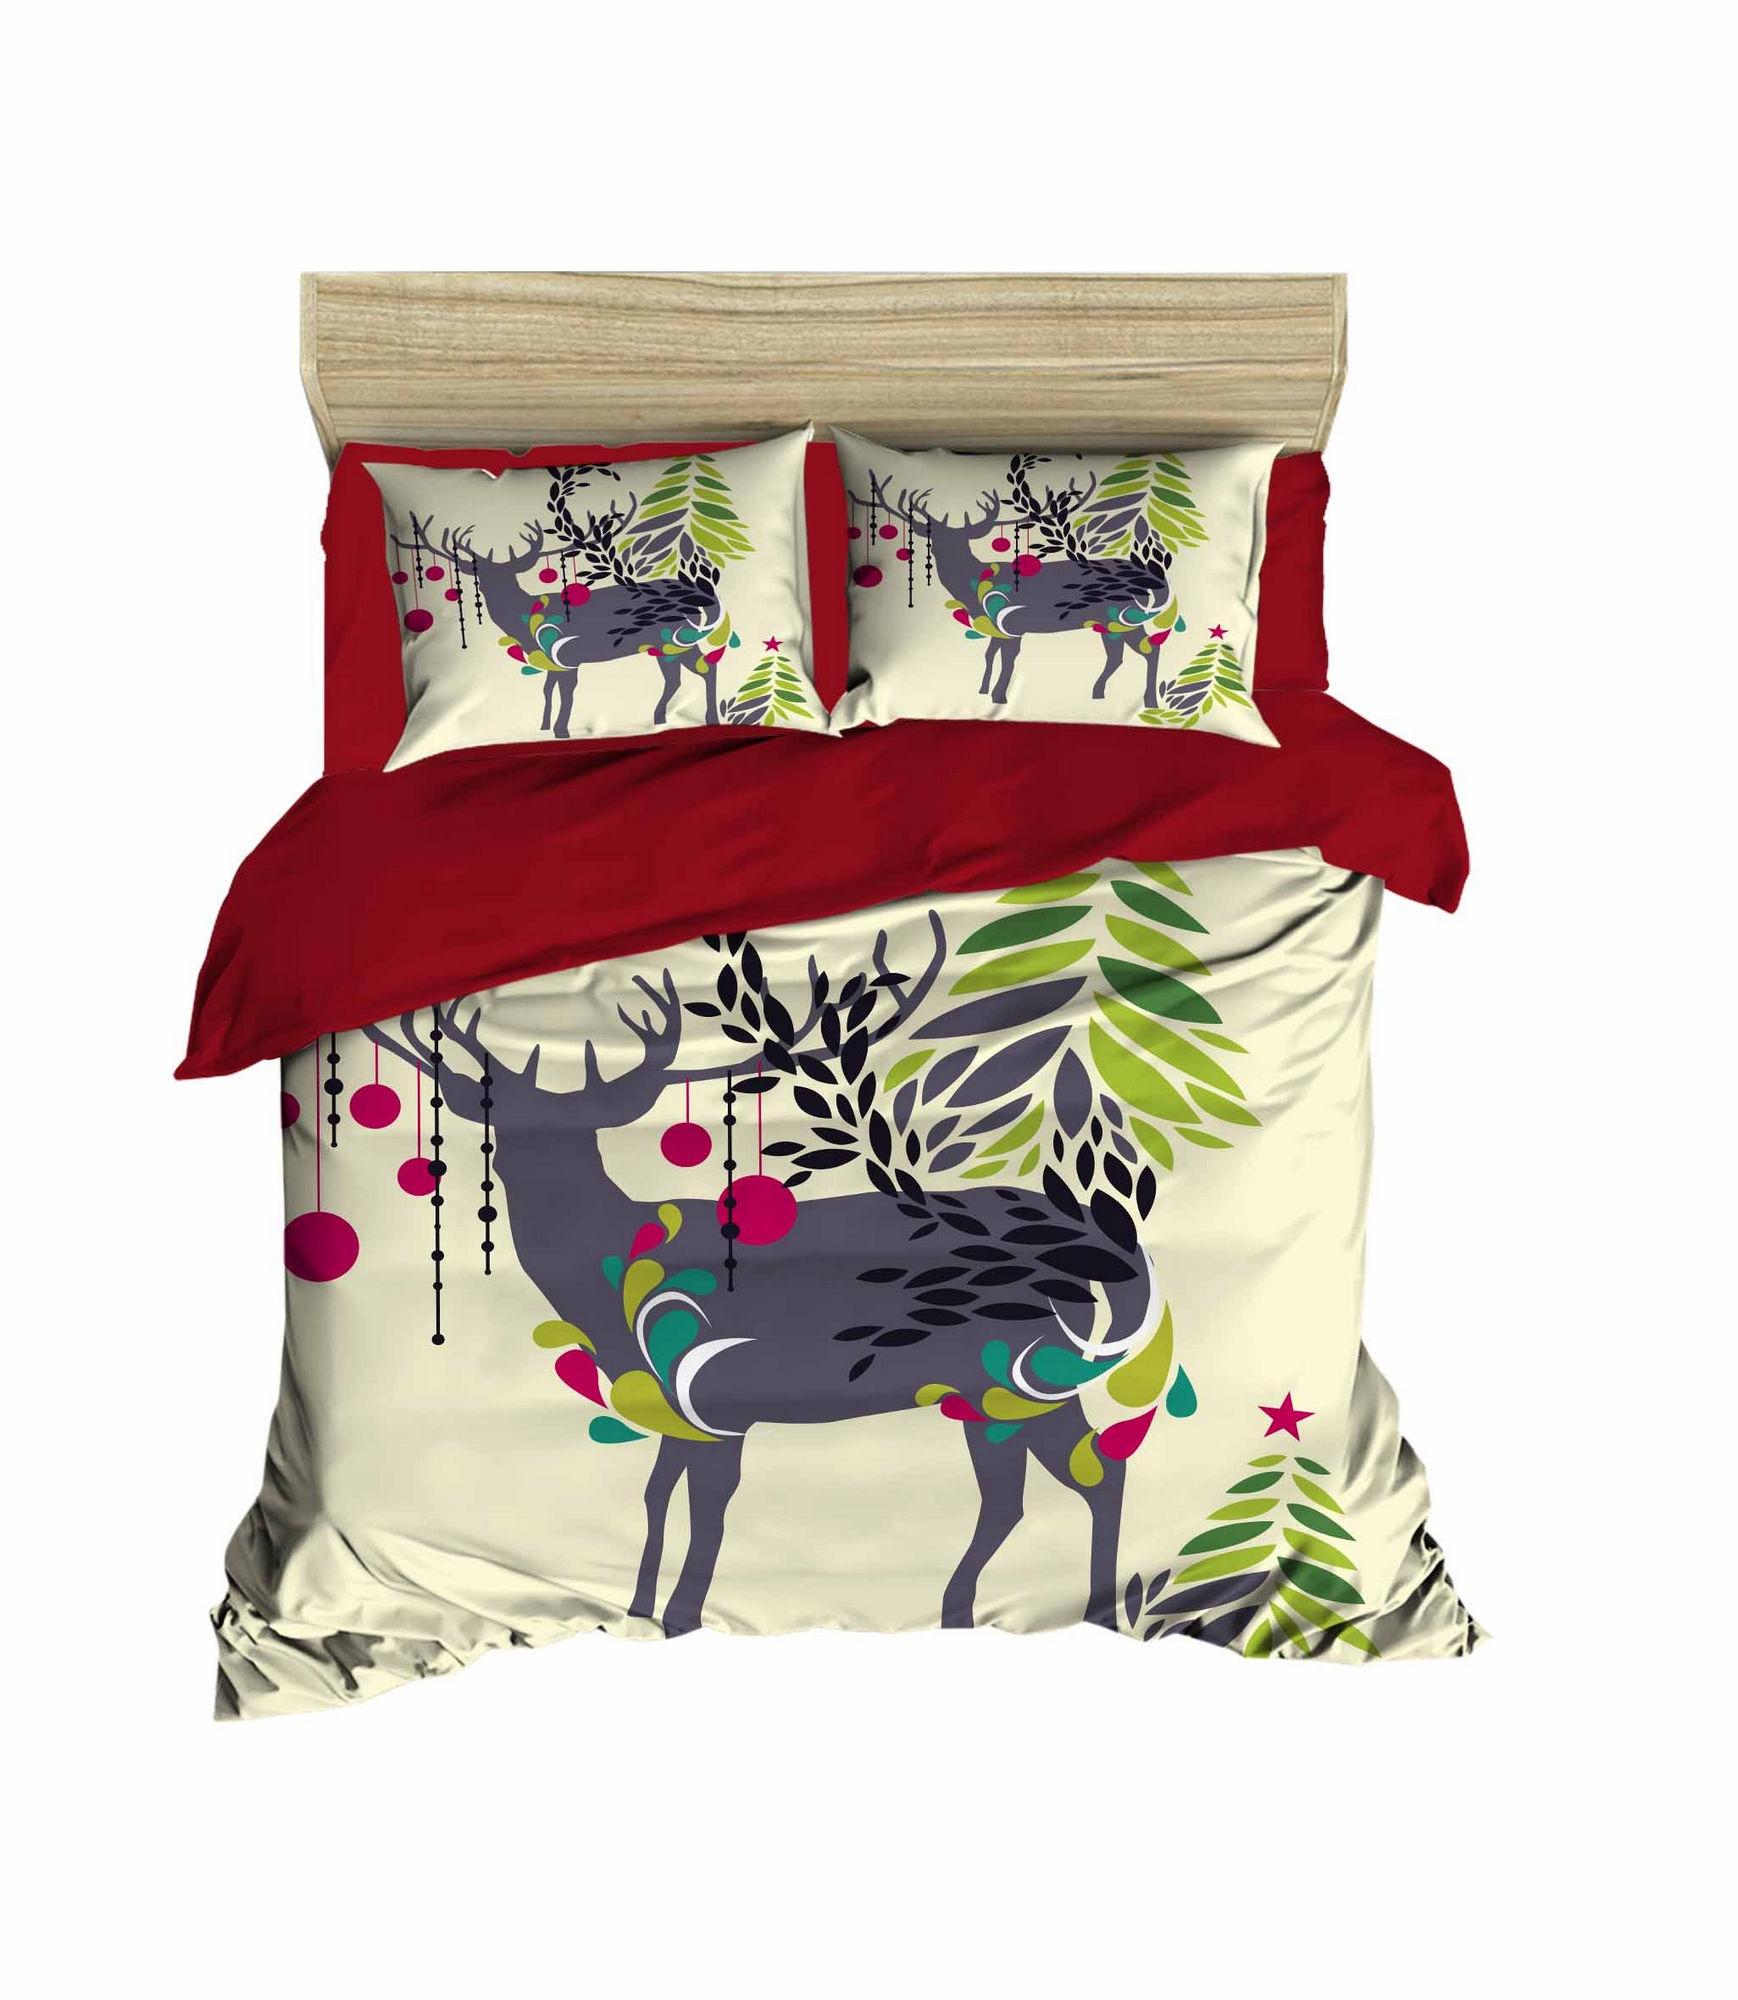 Lenjerie de pat din bumbac si microfibra Christmas 459 Multicolor, 200 x 220 cm